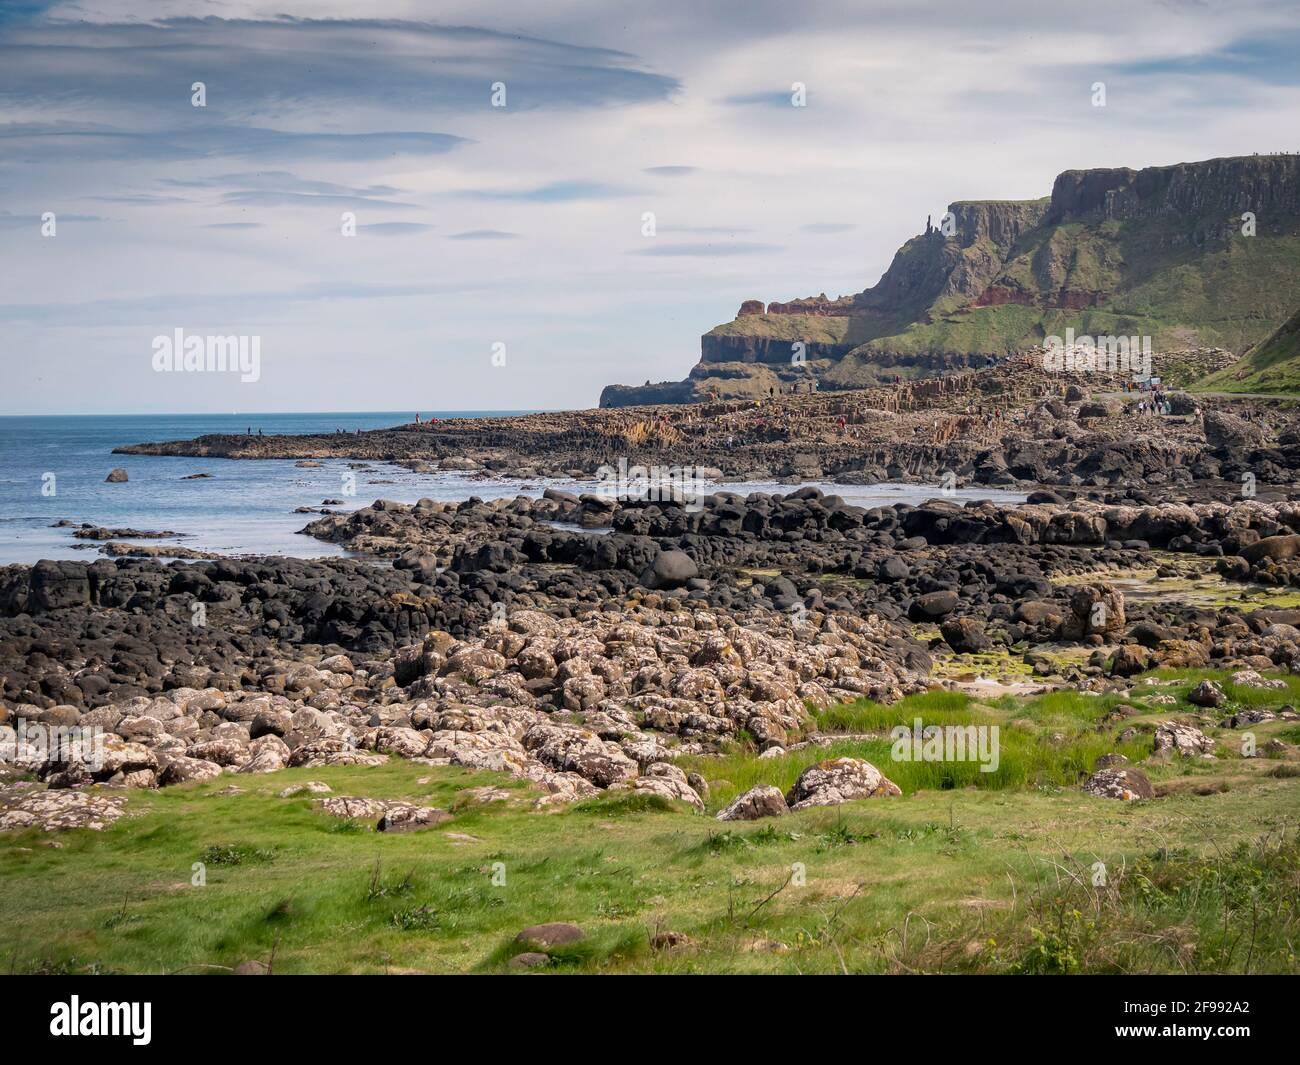 Beautiful Giants Causeway Coast in Northern Ireland - travel photography Stock Photo